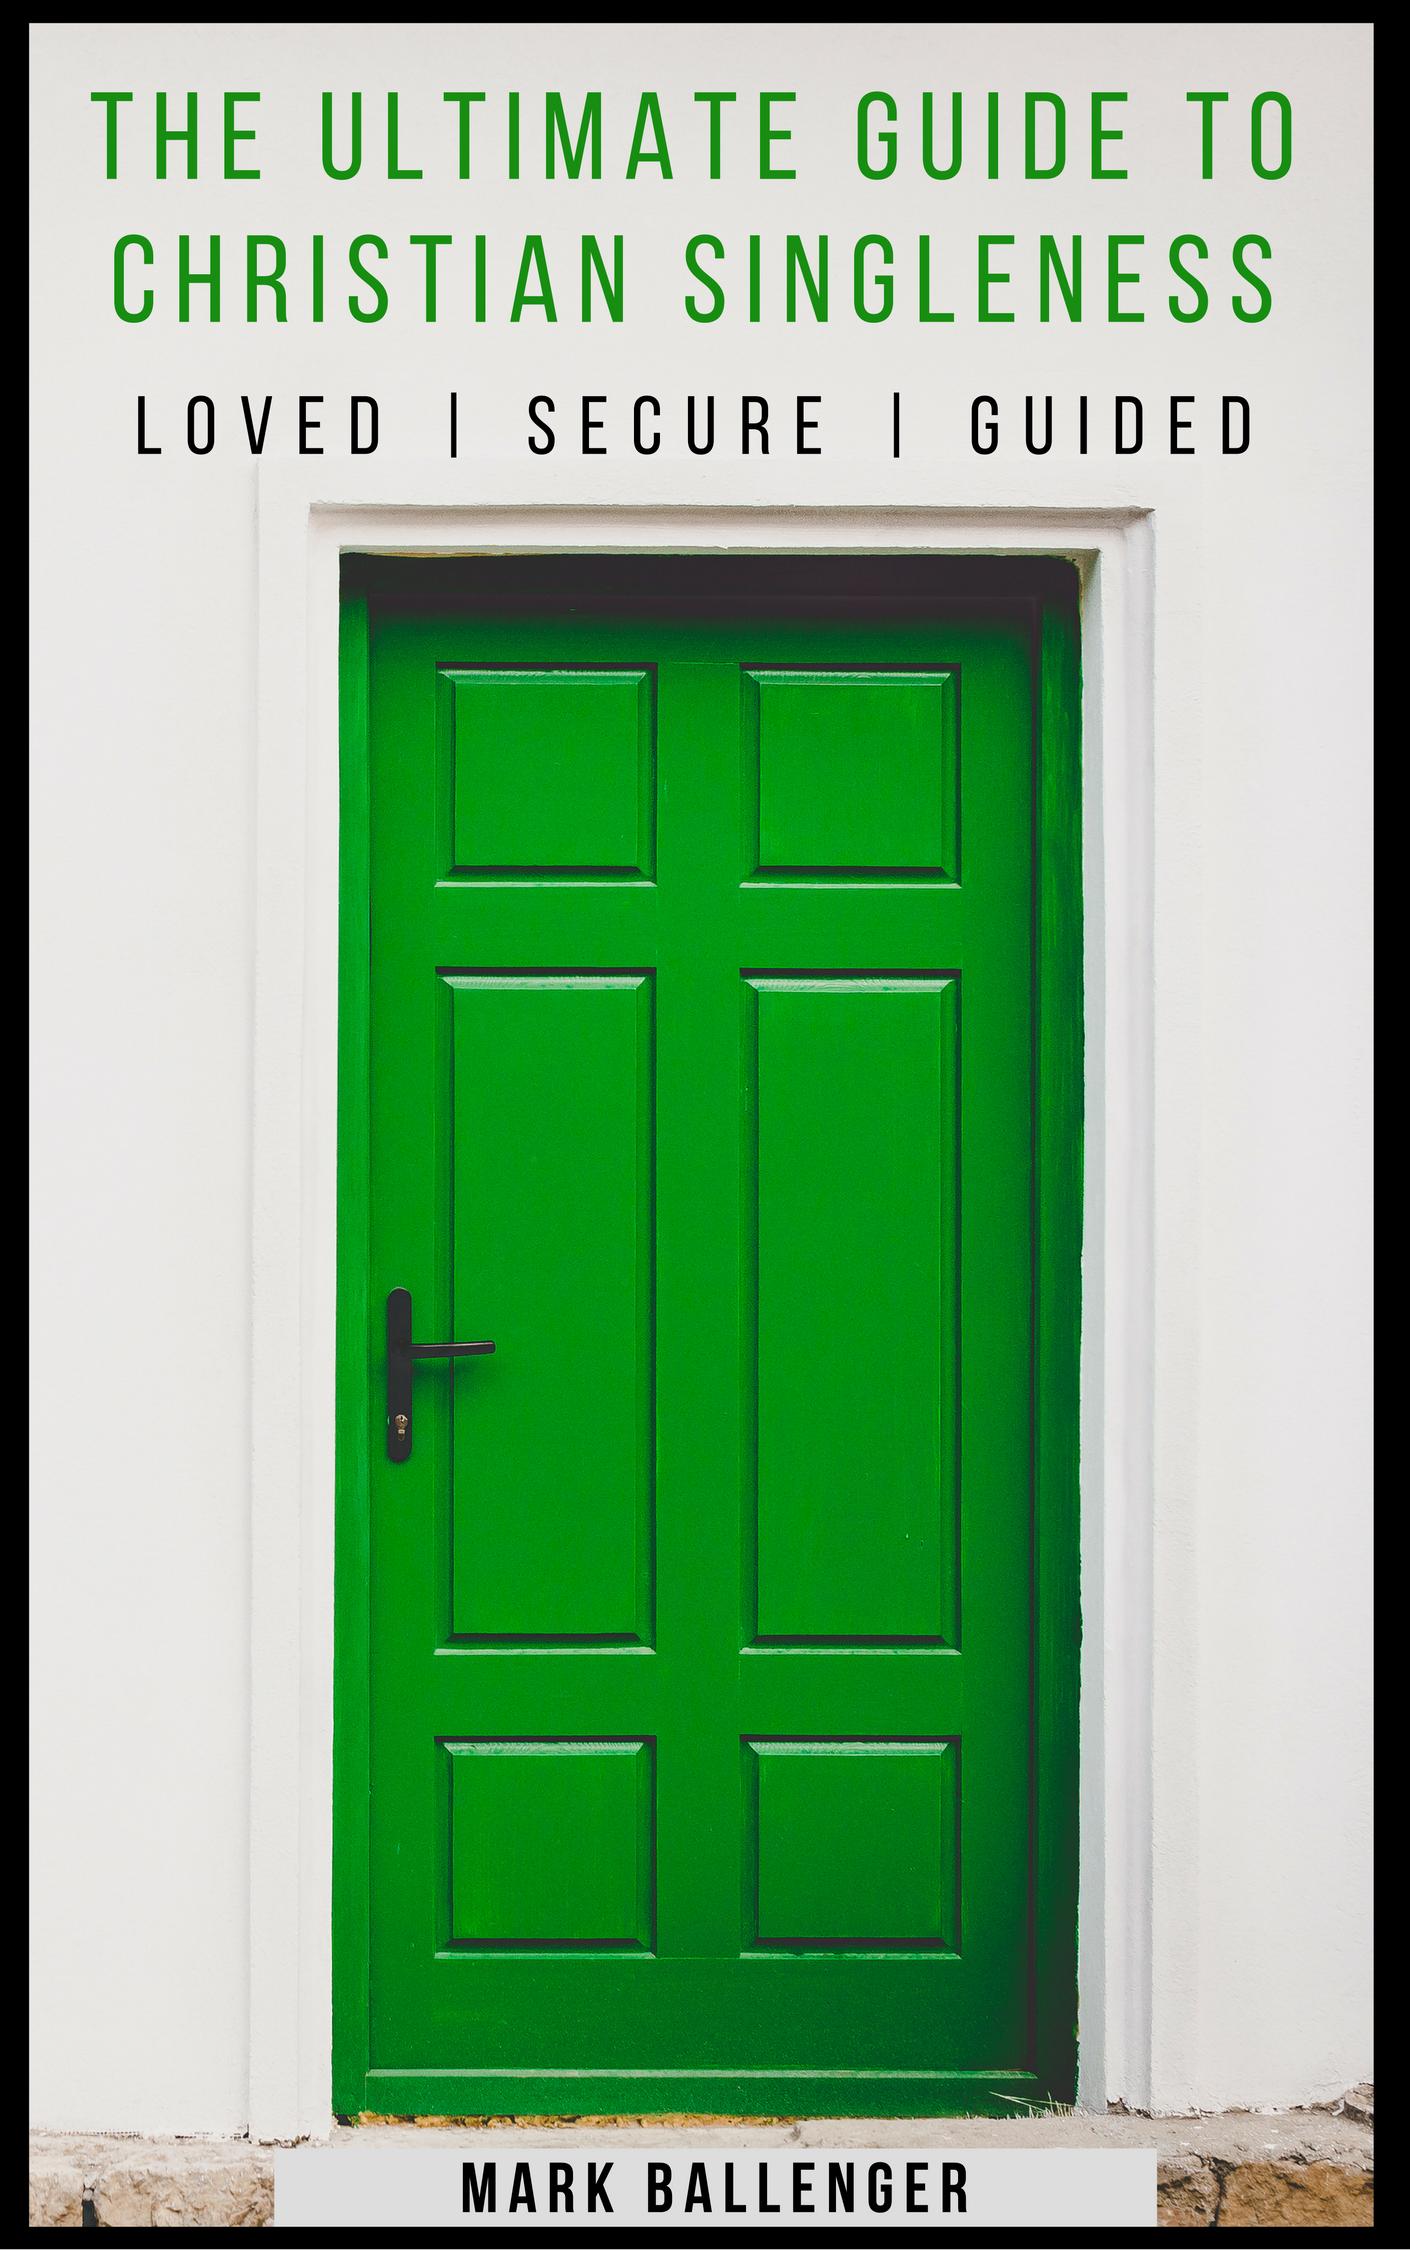 Christian singleness Bible study